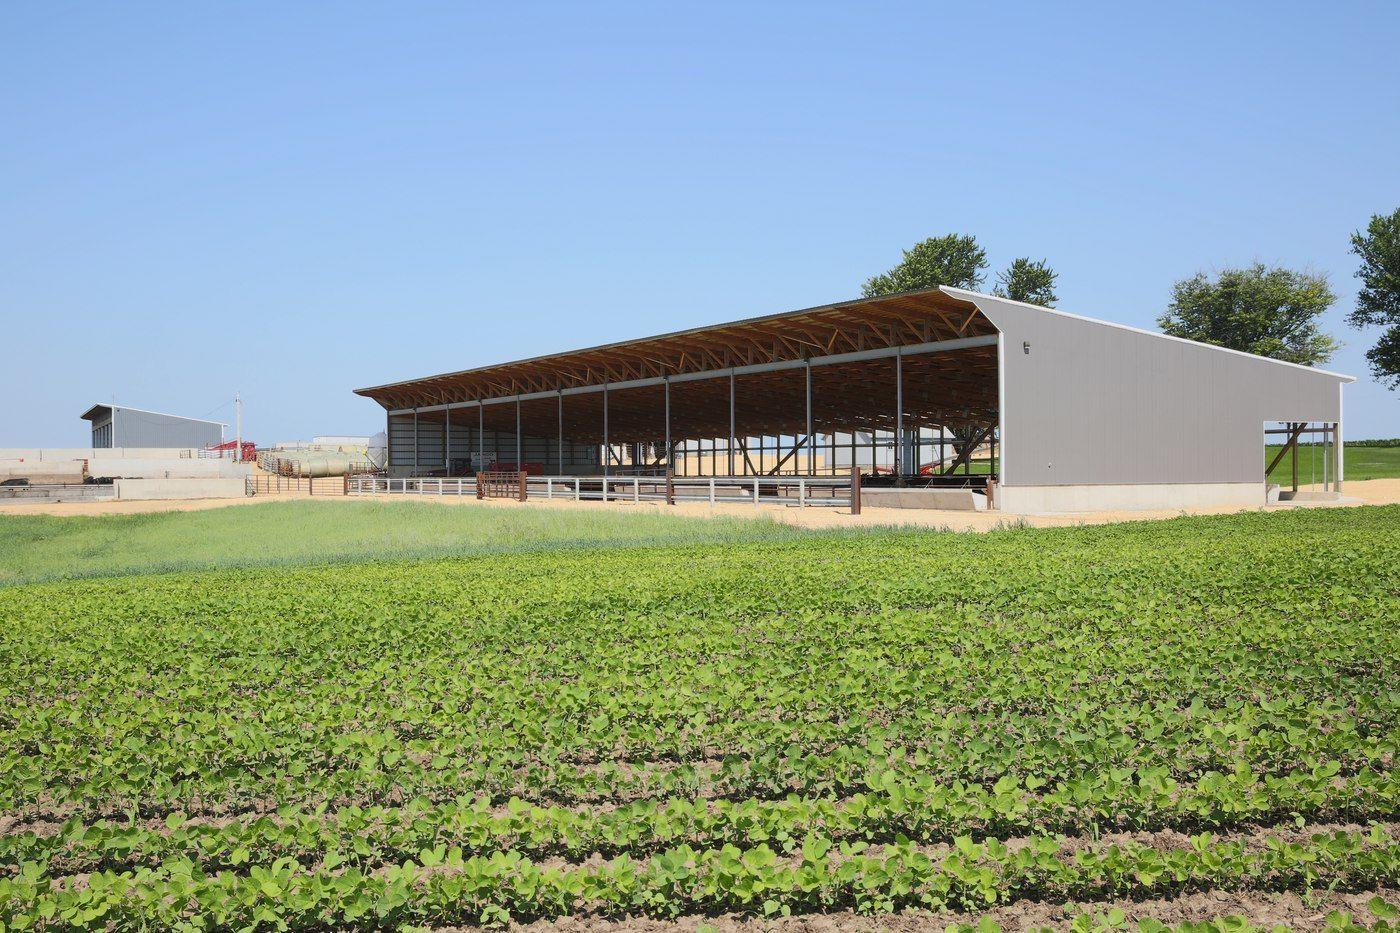 Ryan Jargo_Slatted Facility_Monoslope Beef Barns